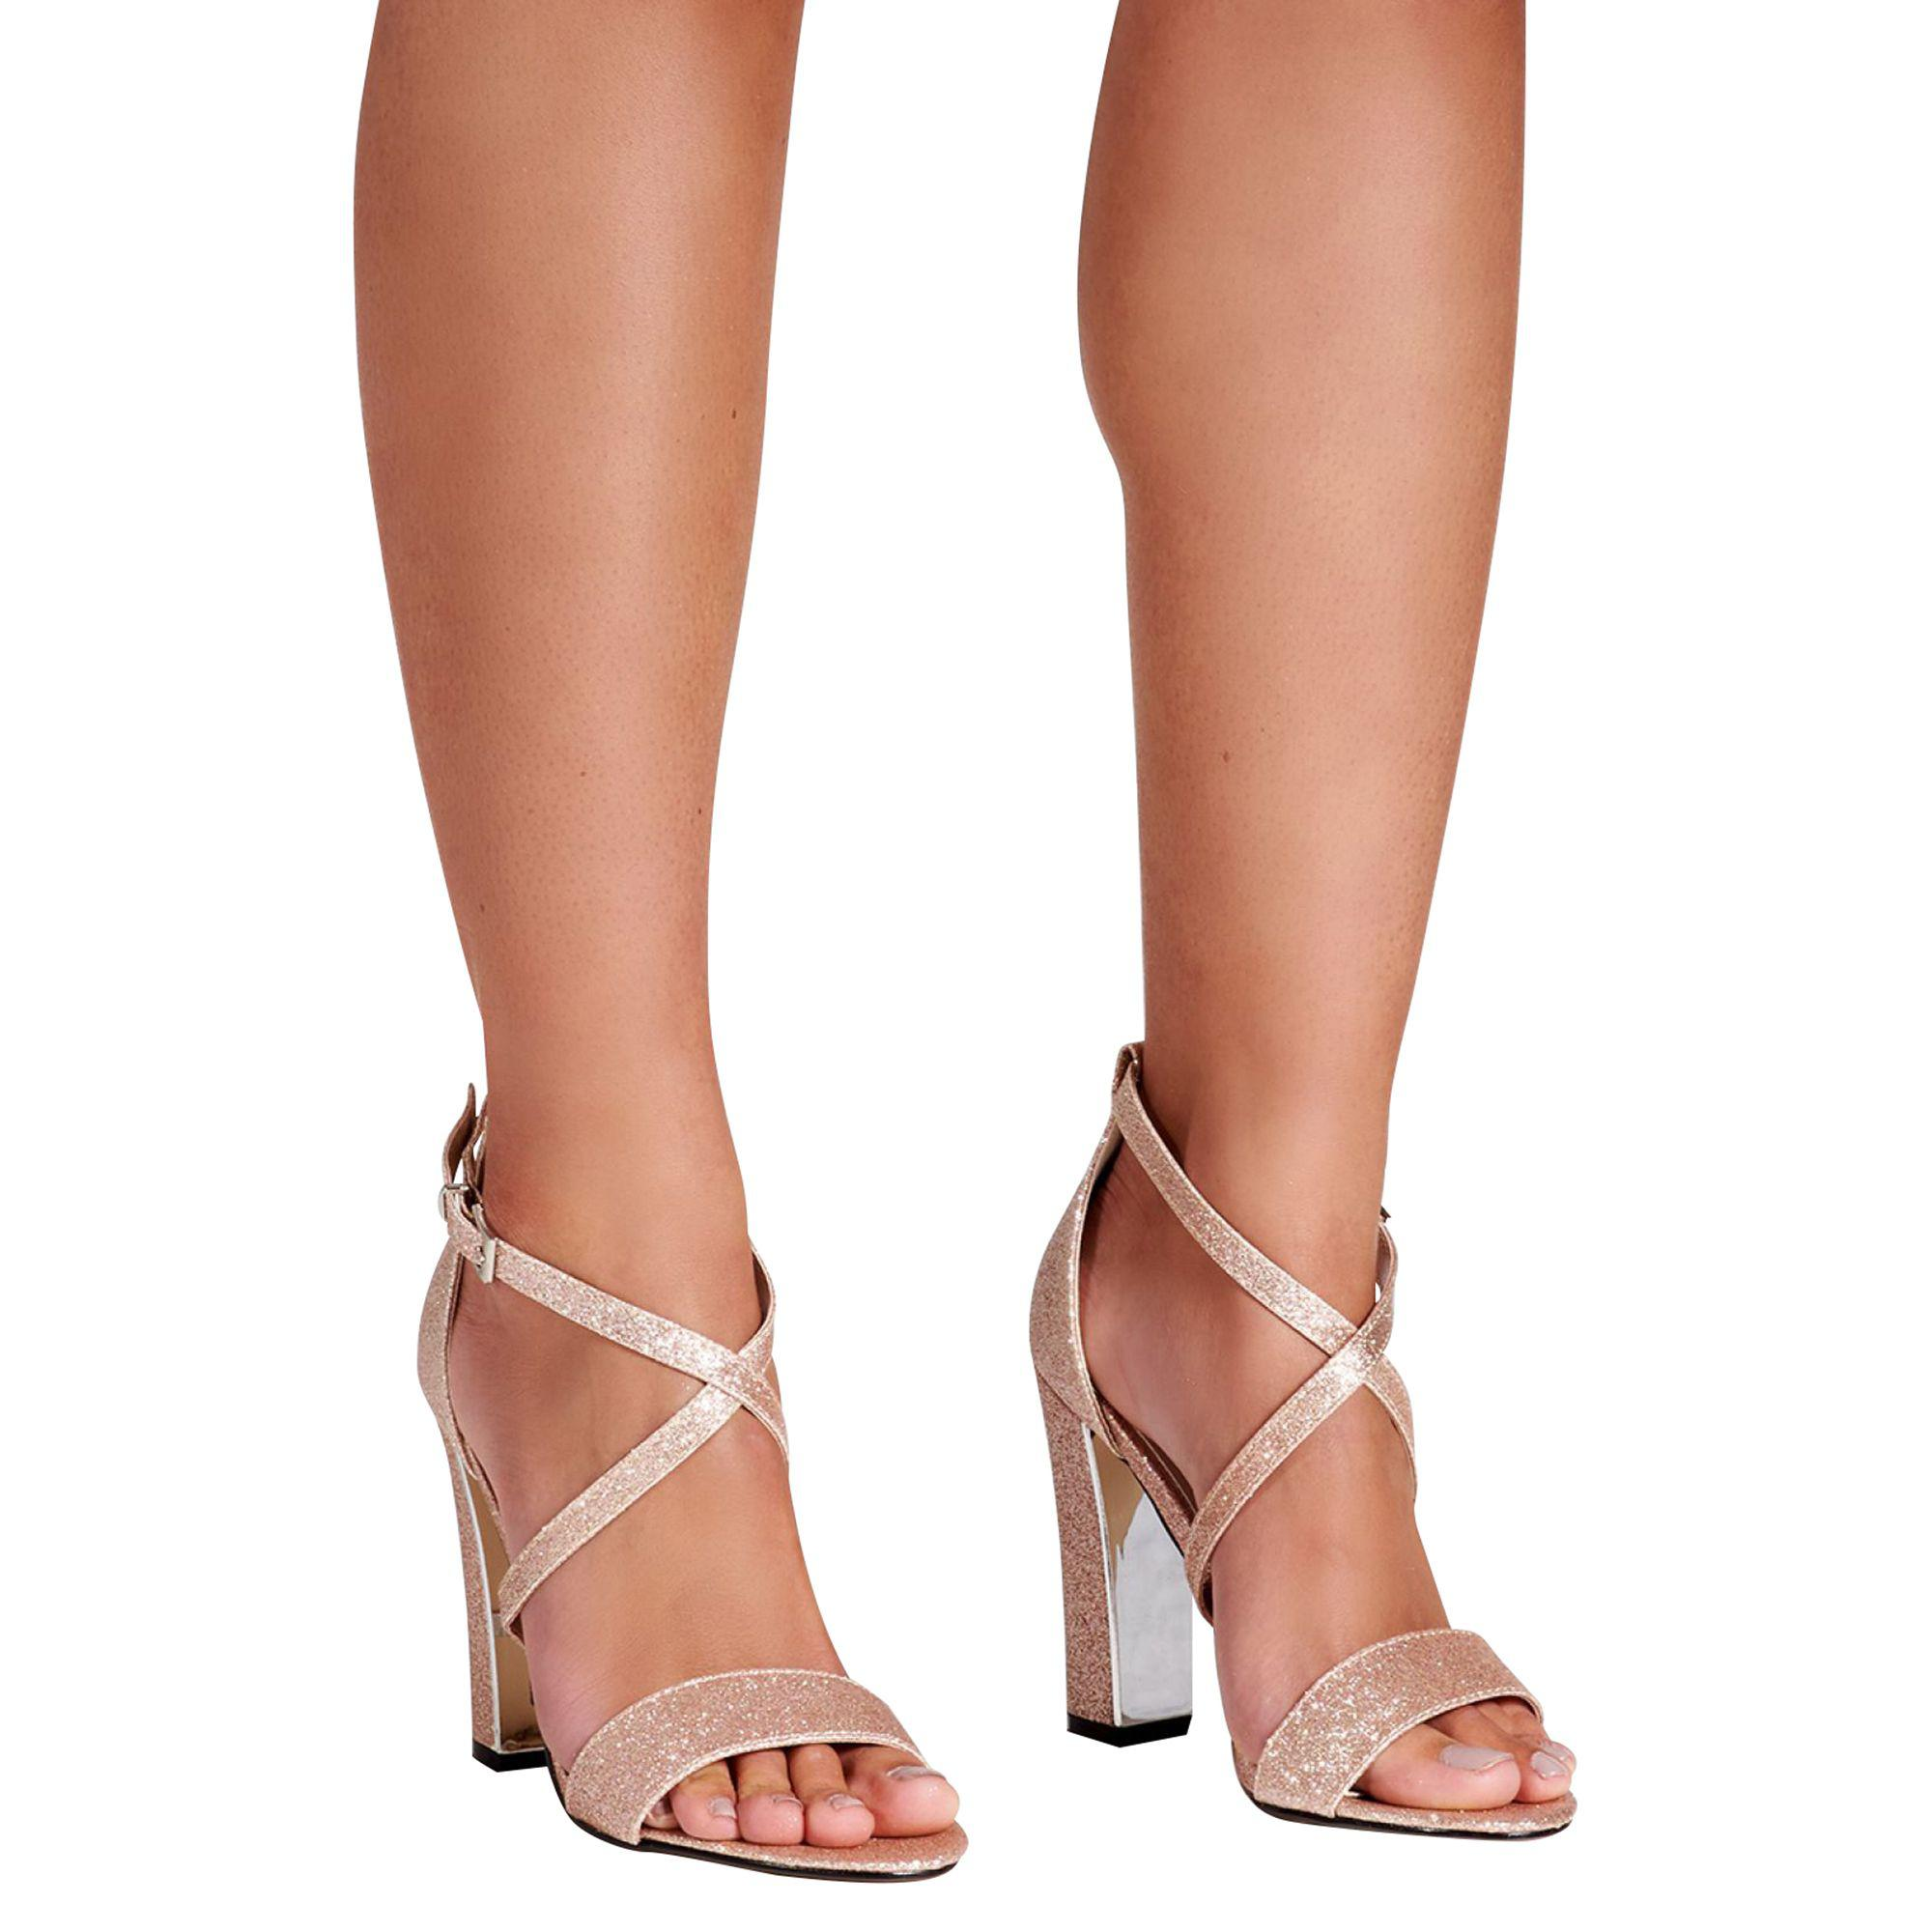 3d36d7bfad1 Quiz - Metallic Rose Gold Glitter Block Heel Strappy Sandals - Lyst. View  fullscreen